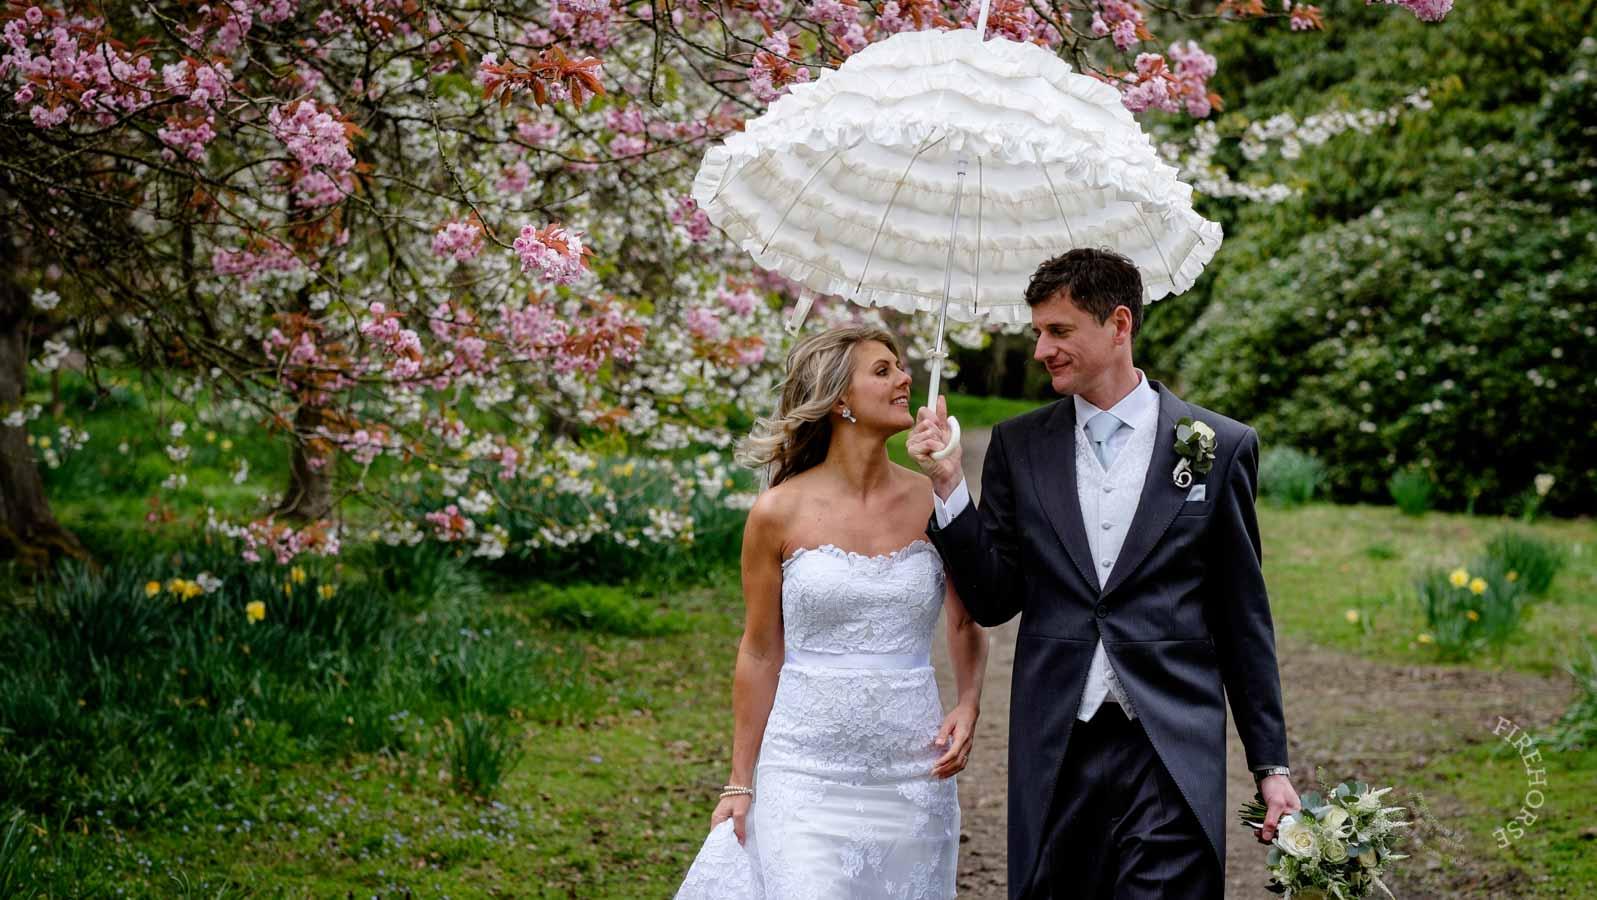 Swinton-Park-Spring-Wedding-243